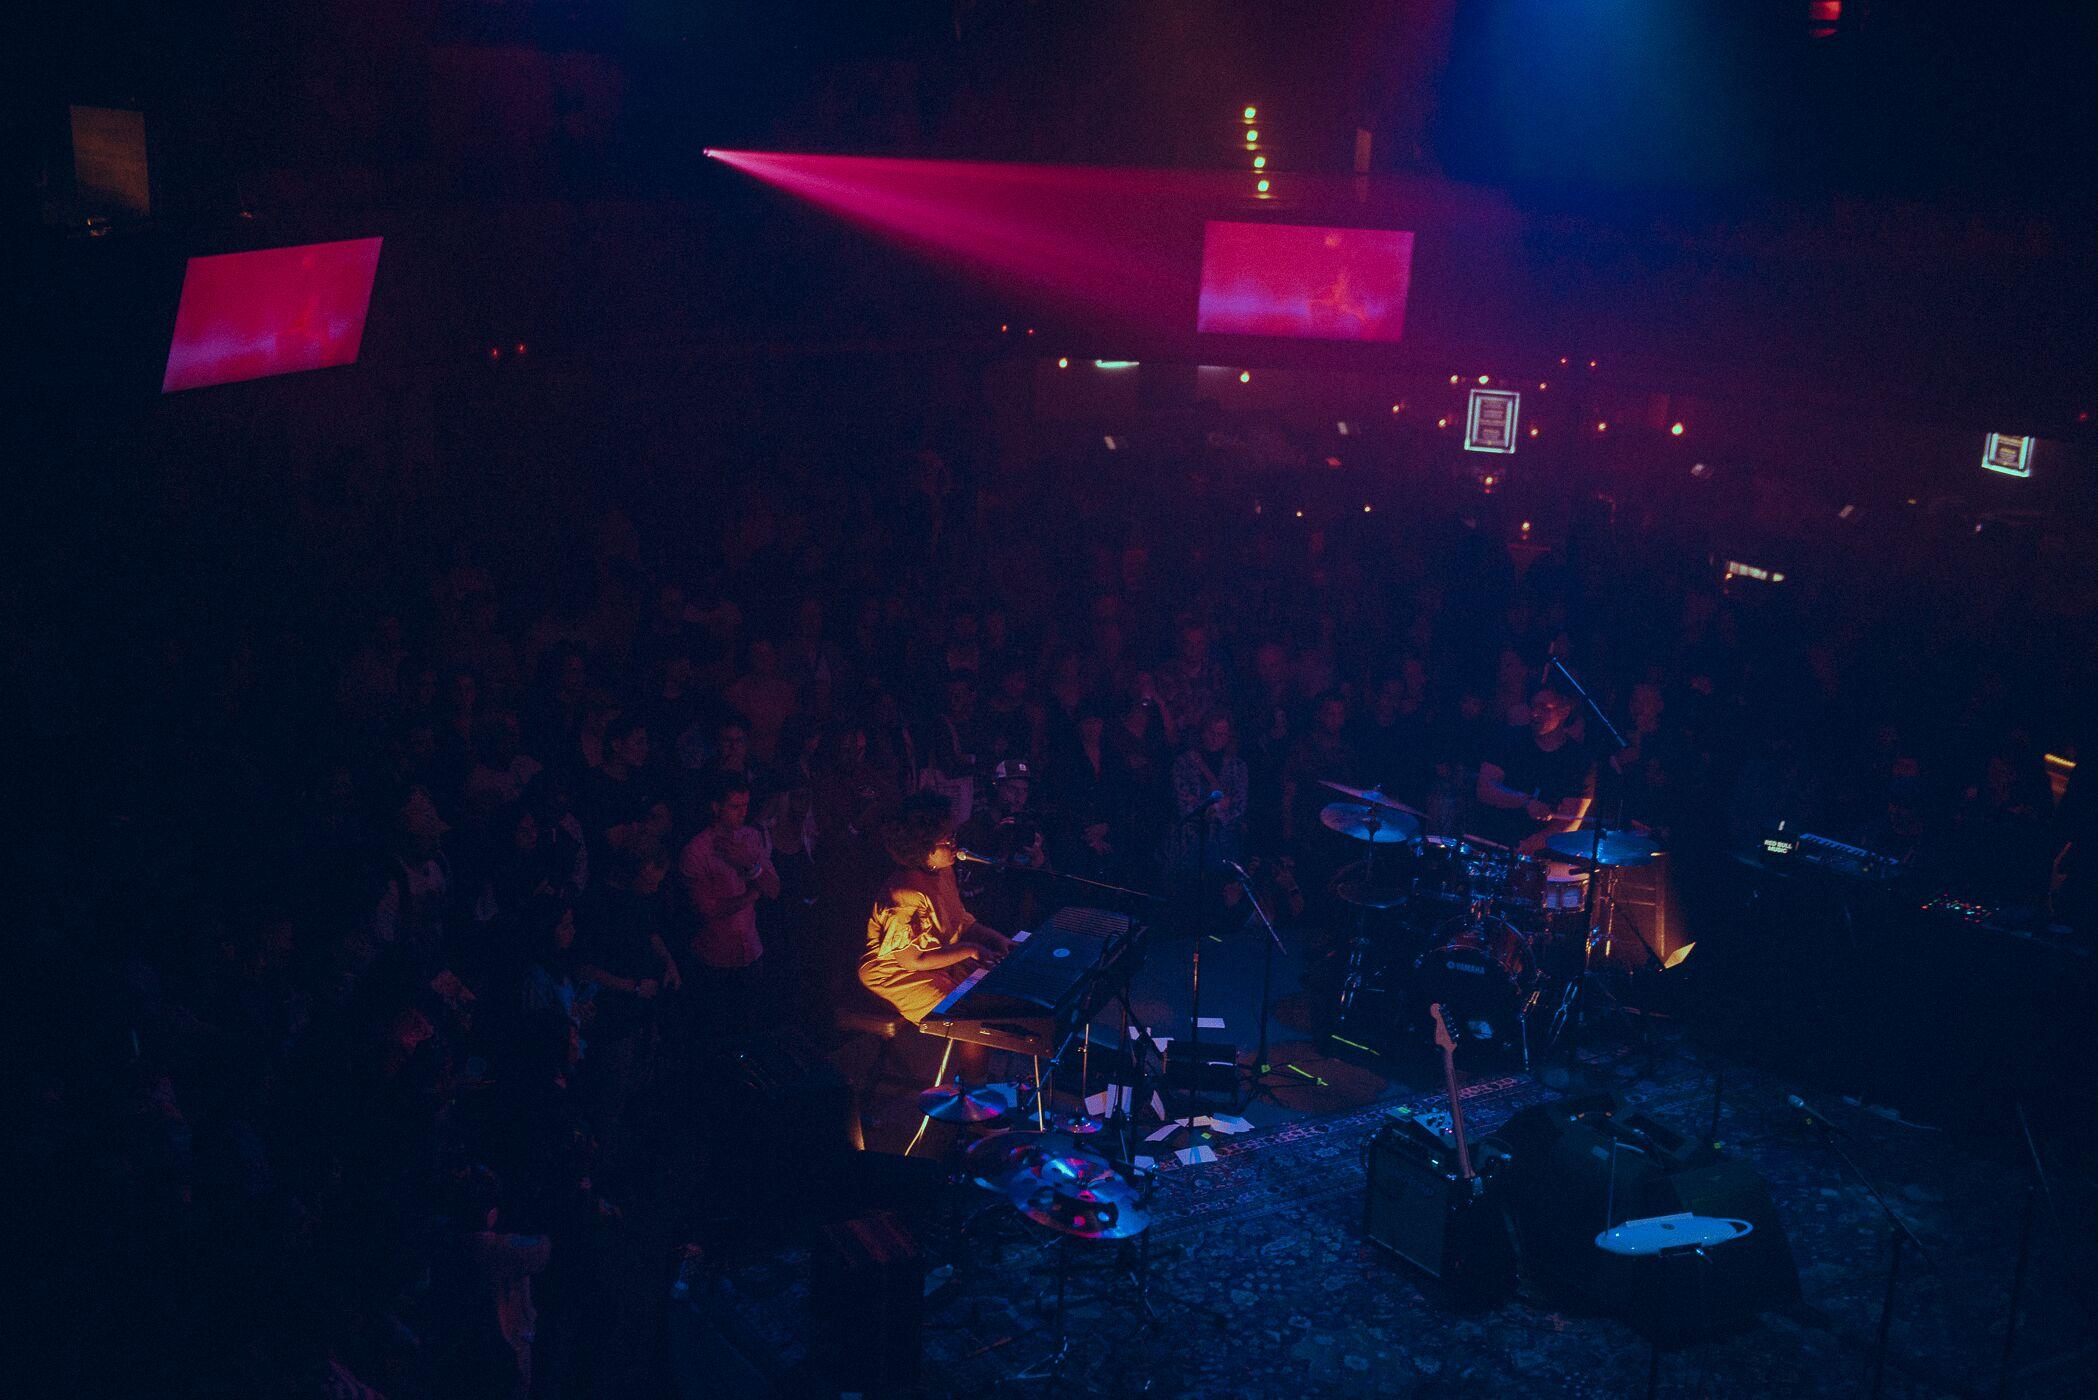 Red Bull Music Presents: Round Robin  Chicago, IL  Aug 30, 2018    Photo by Zoe Rain